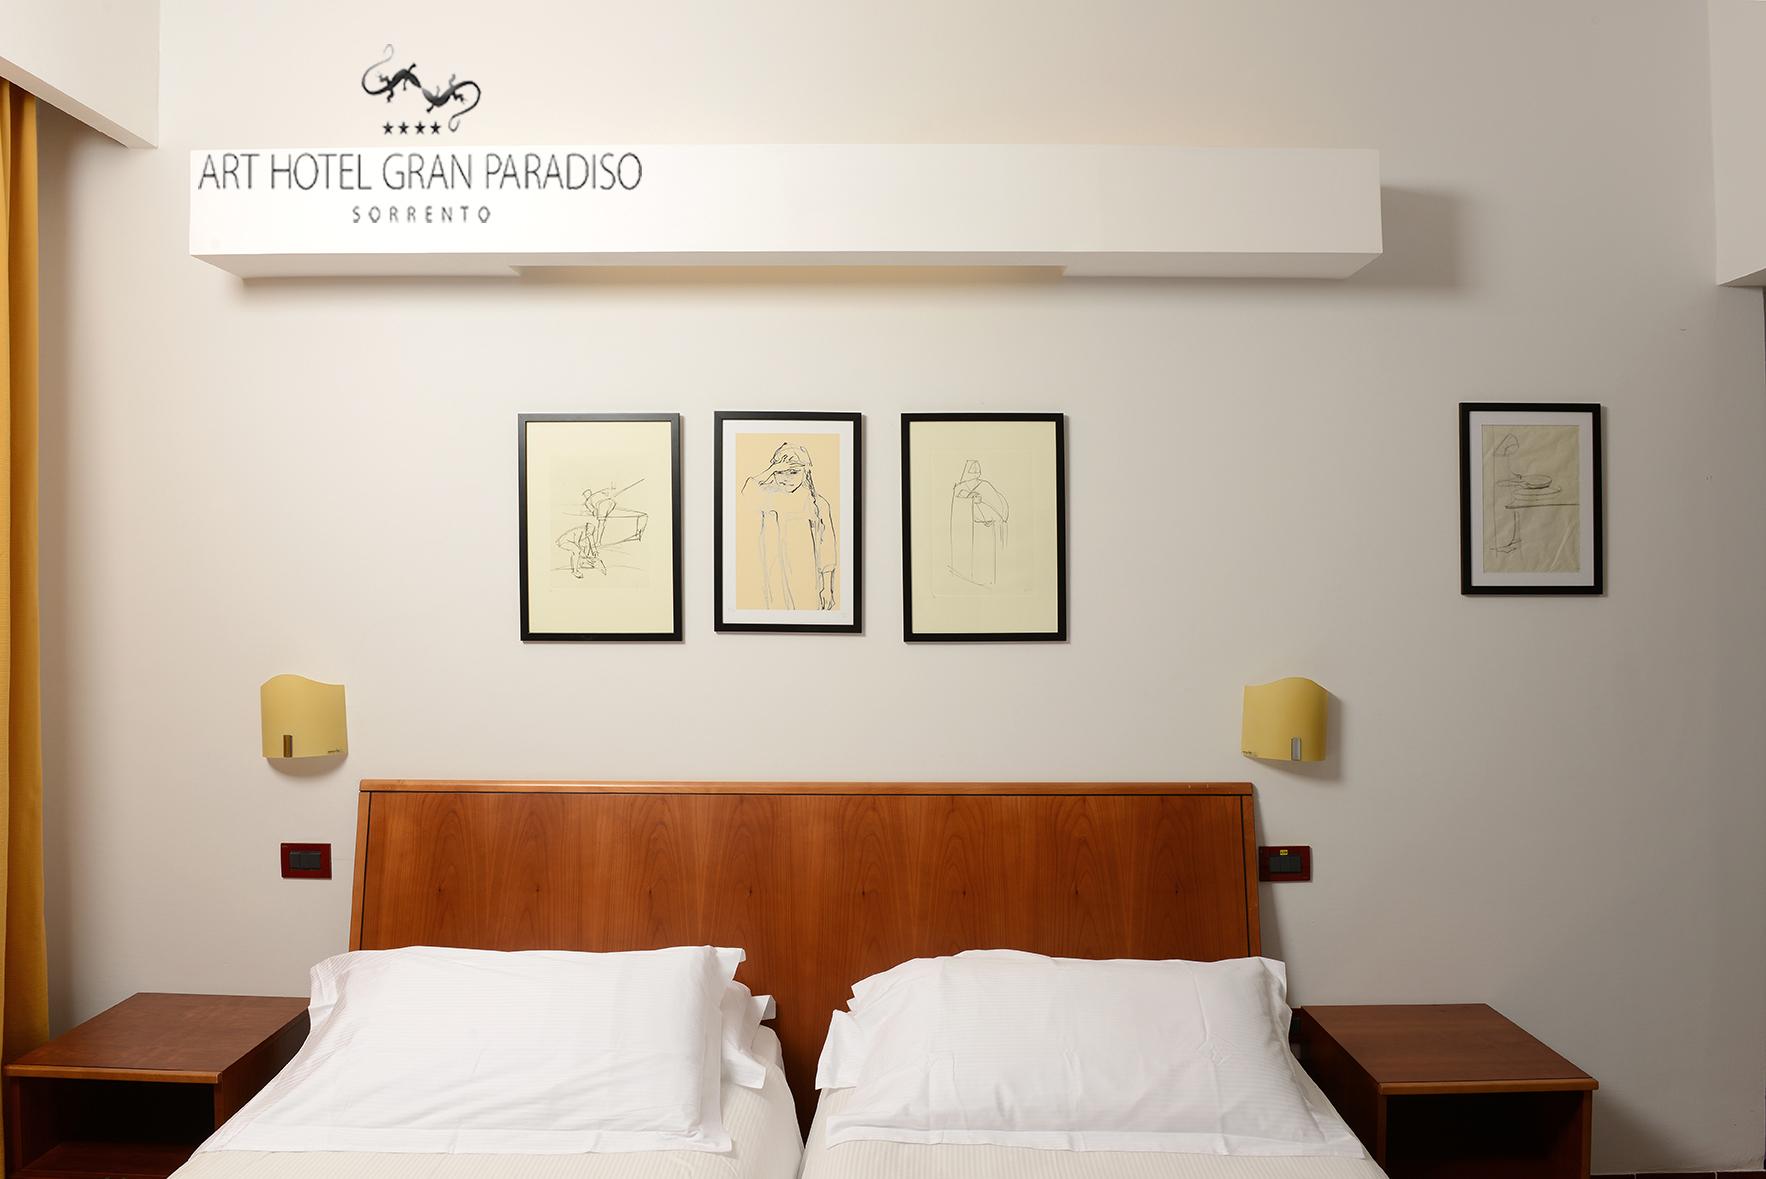 Art_Hotel_Gran_Paradiso_2013_318_Maria_Lai_1.jpg